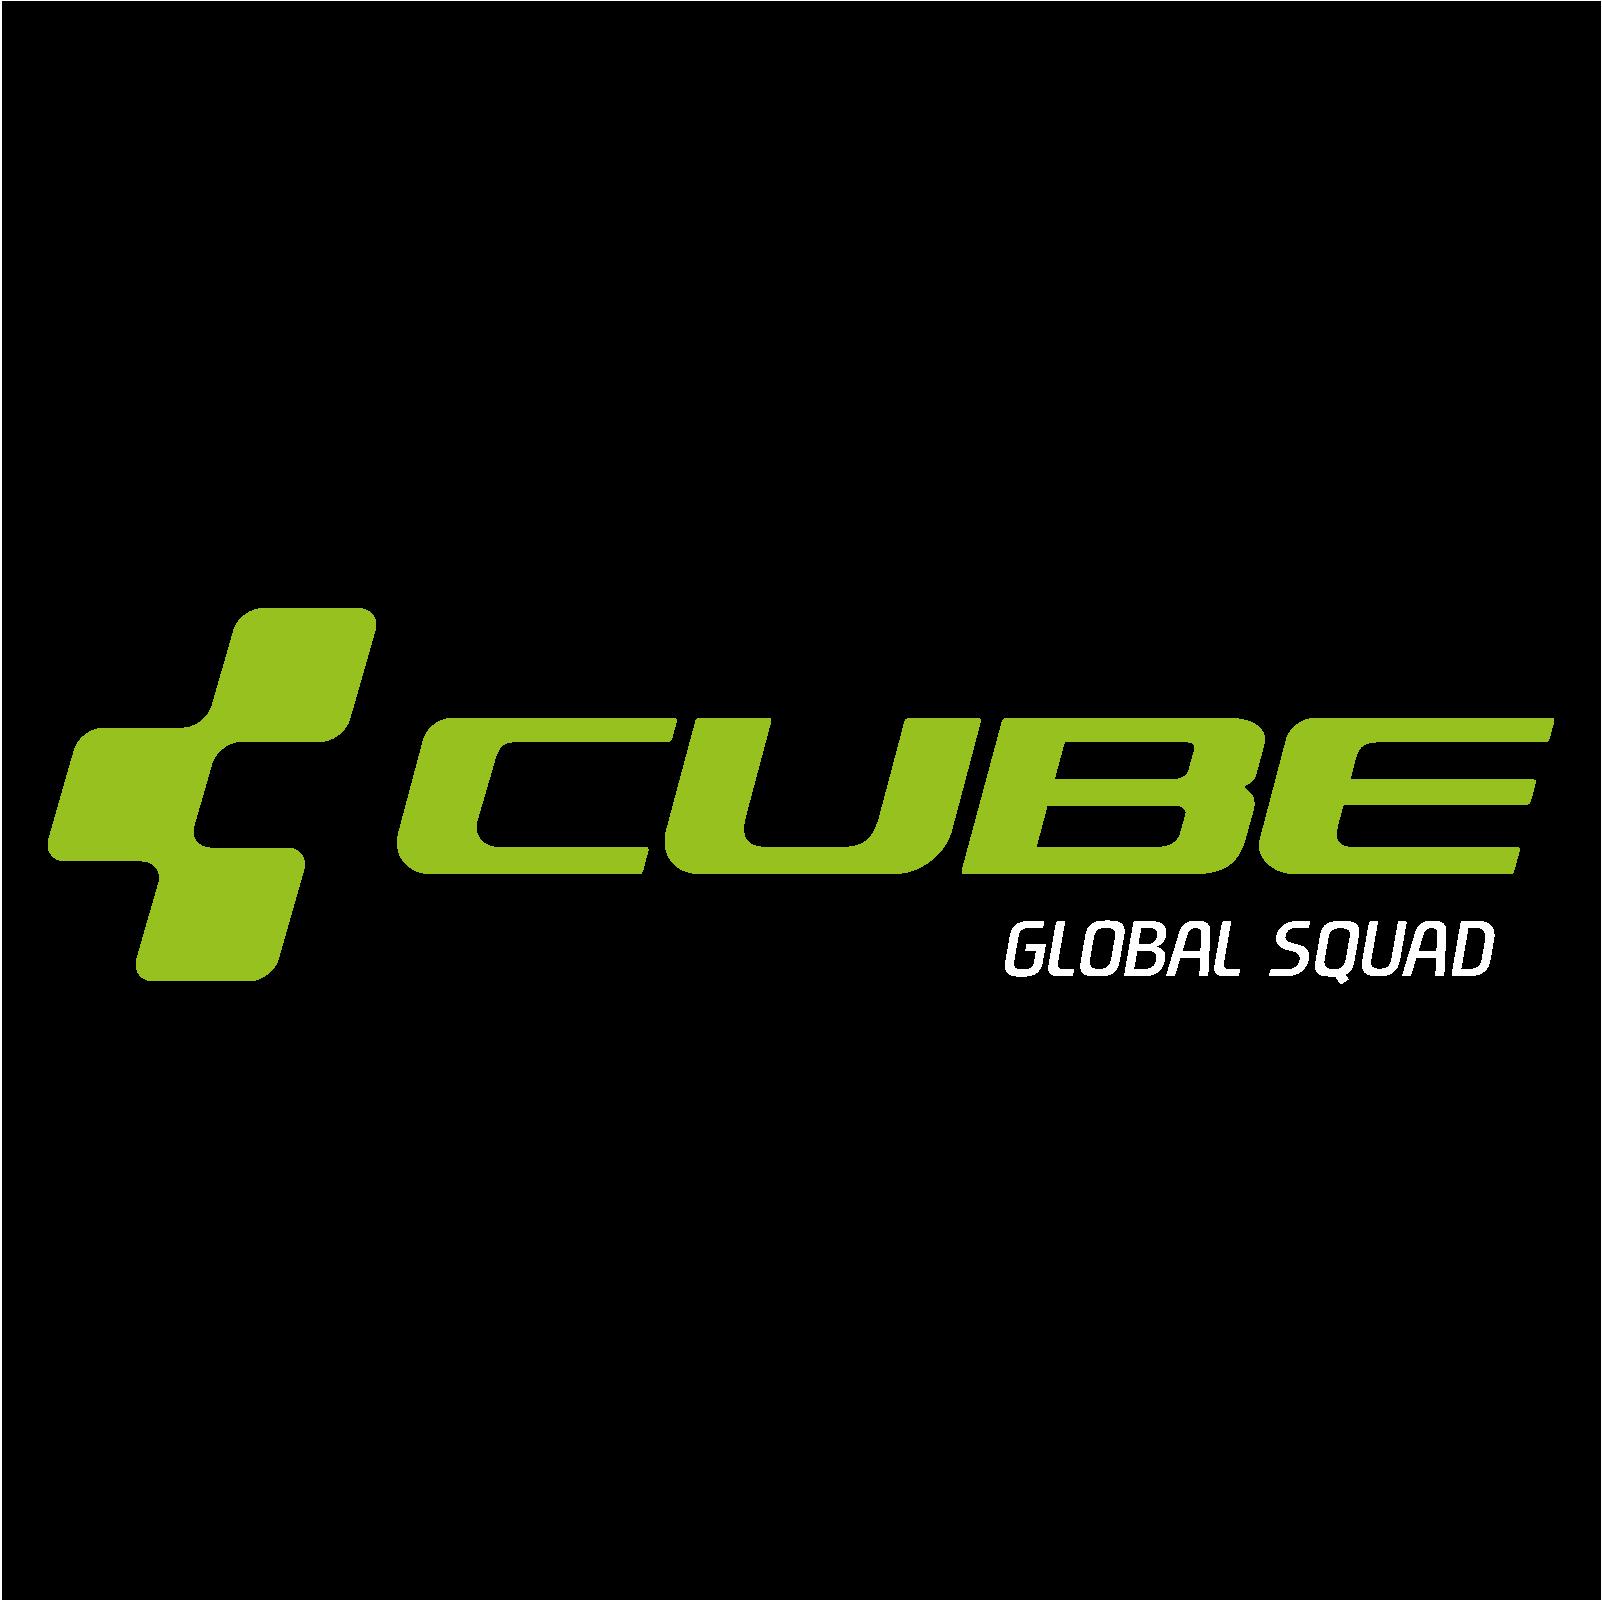 Cube Global Squad: Neues Team im Downhill-Weltcup - MTB-News.de